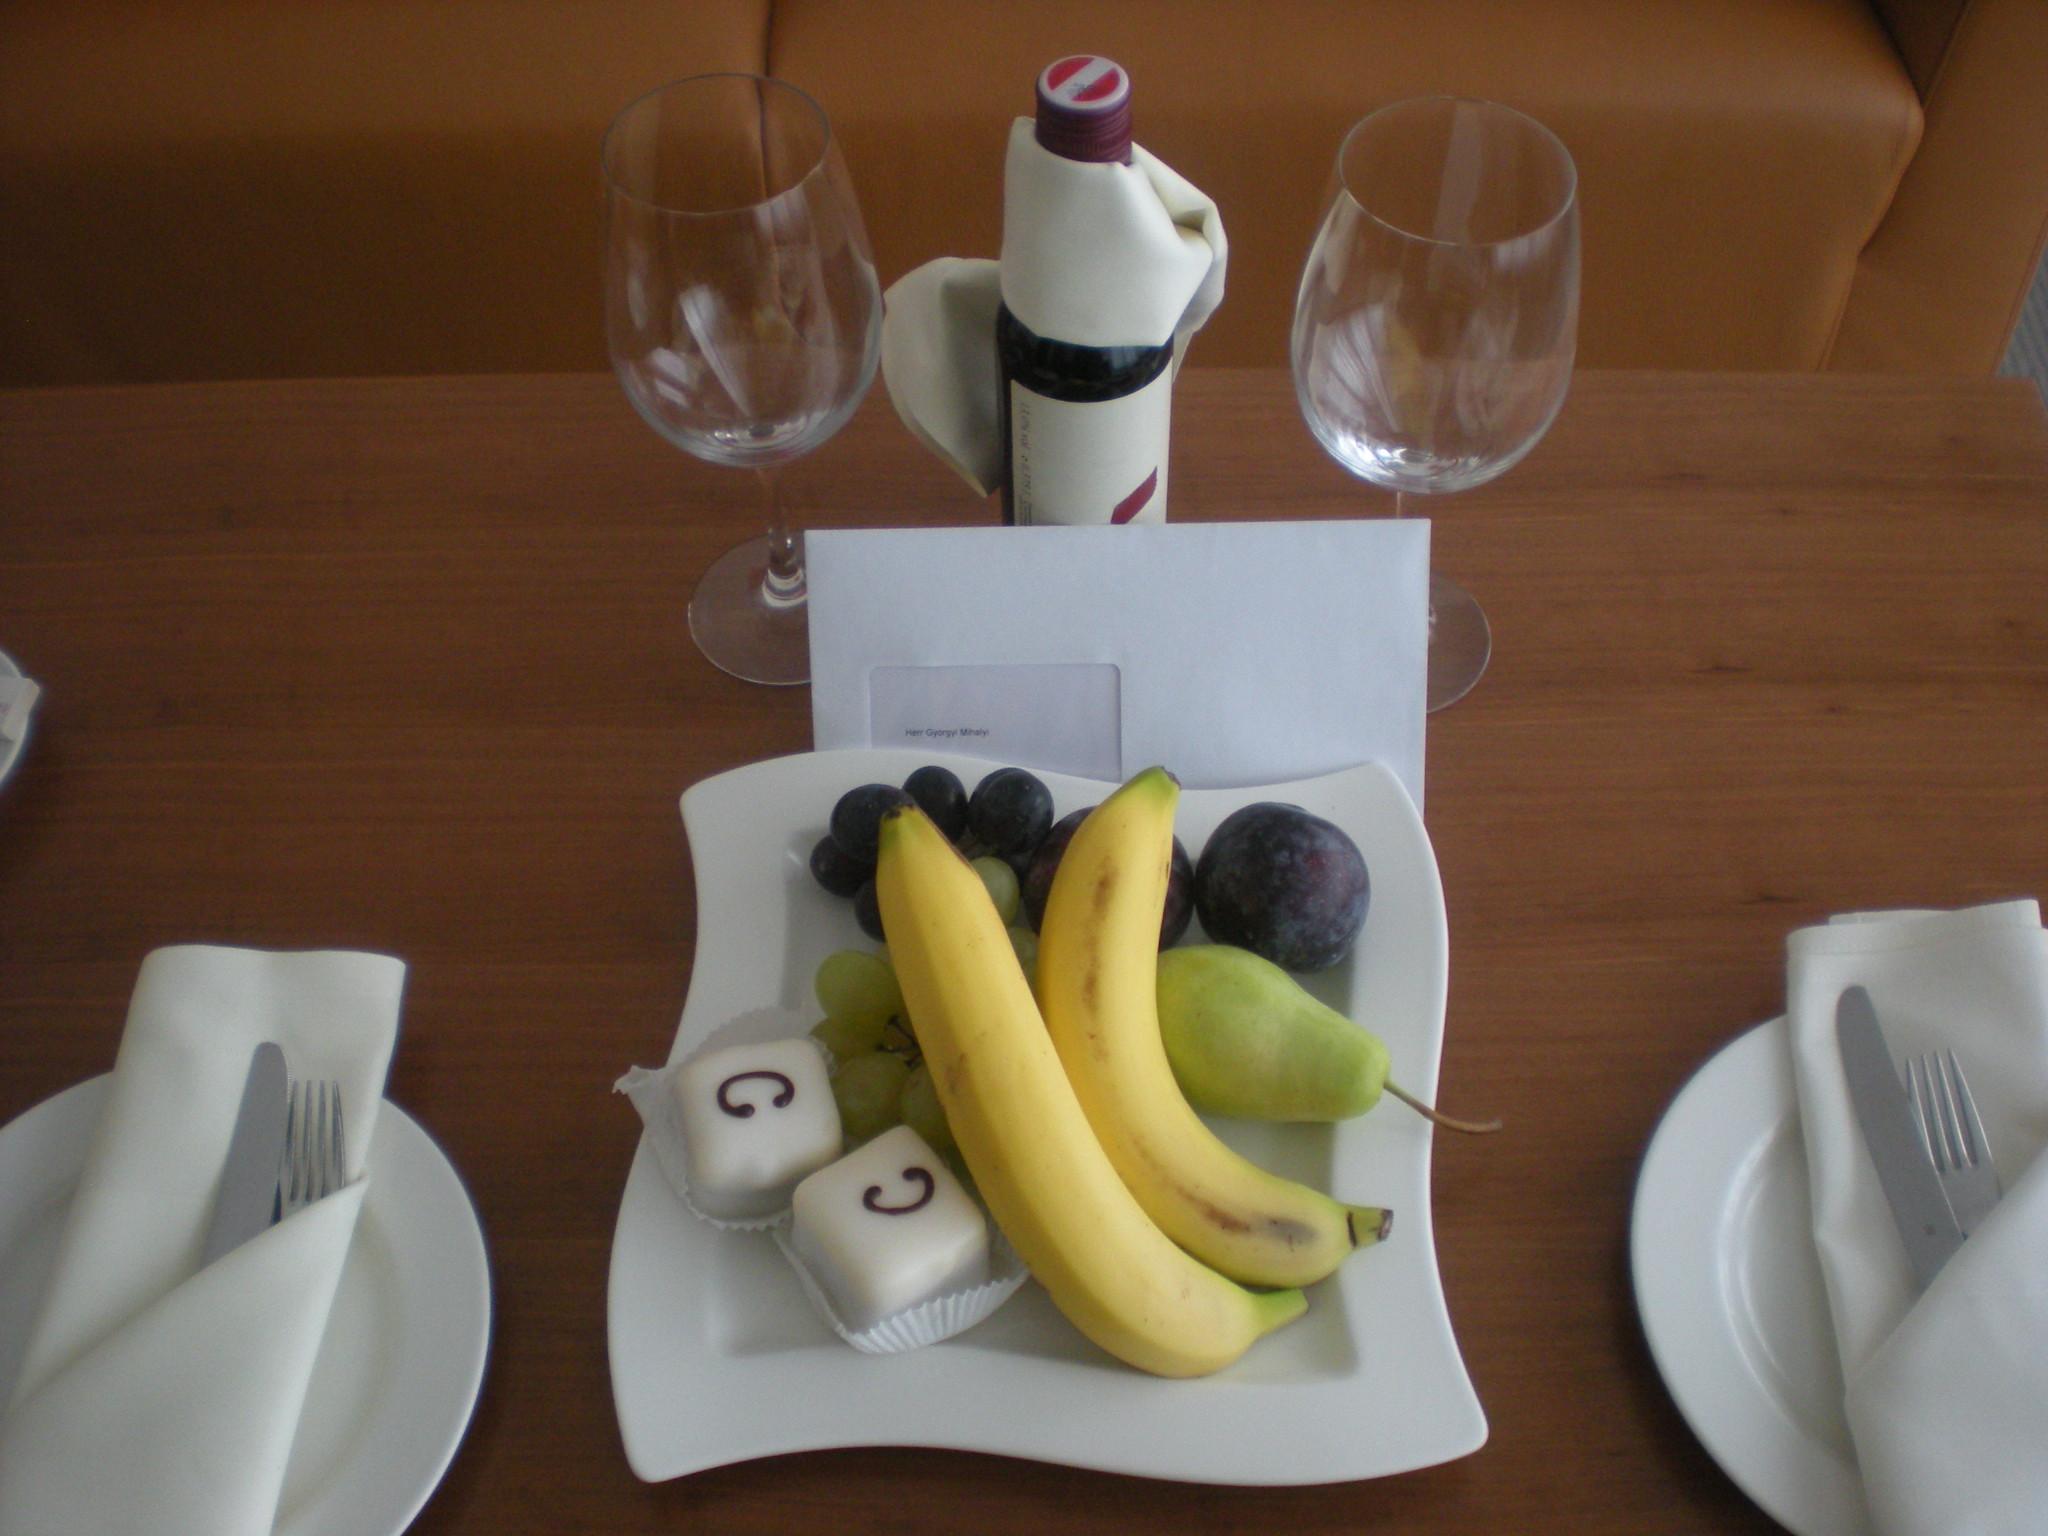 Castellani Parkhotel gift